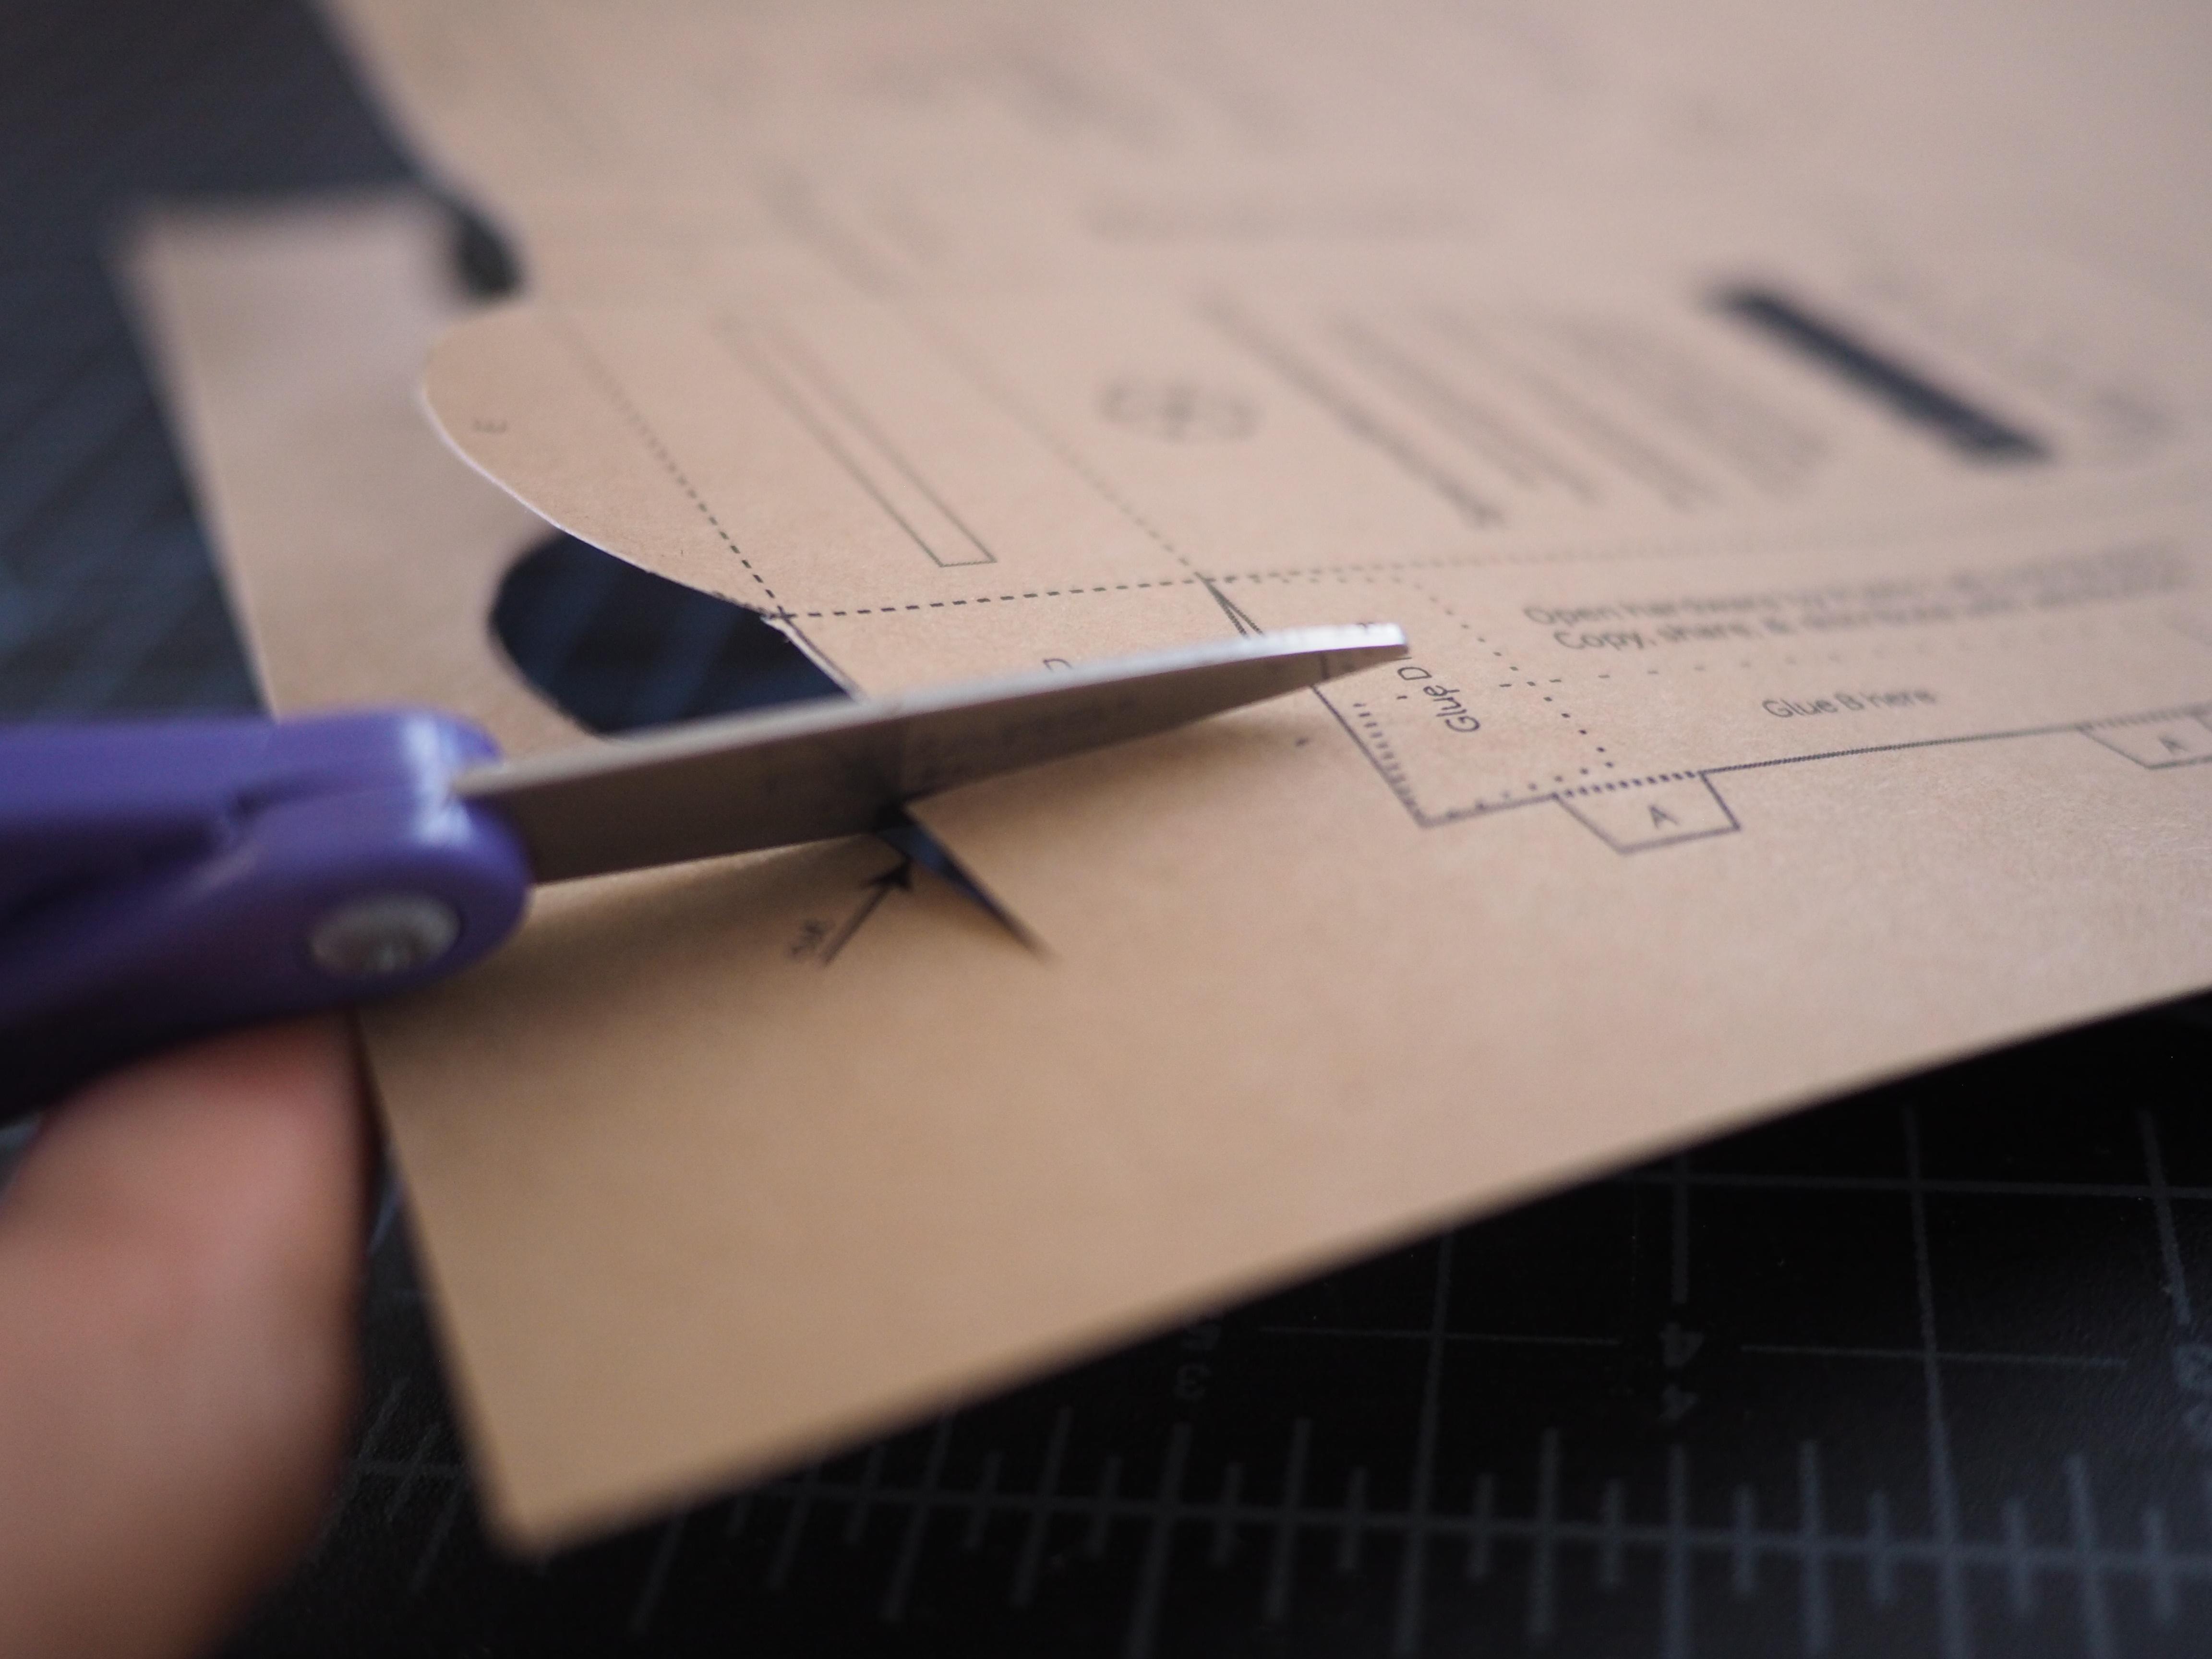 Public Lab Scissors Only Build Of Wider Papercraft Spectrometer